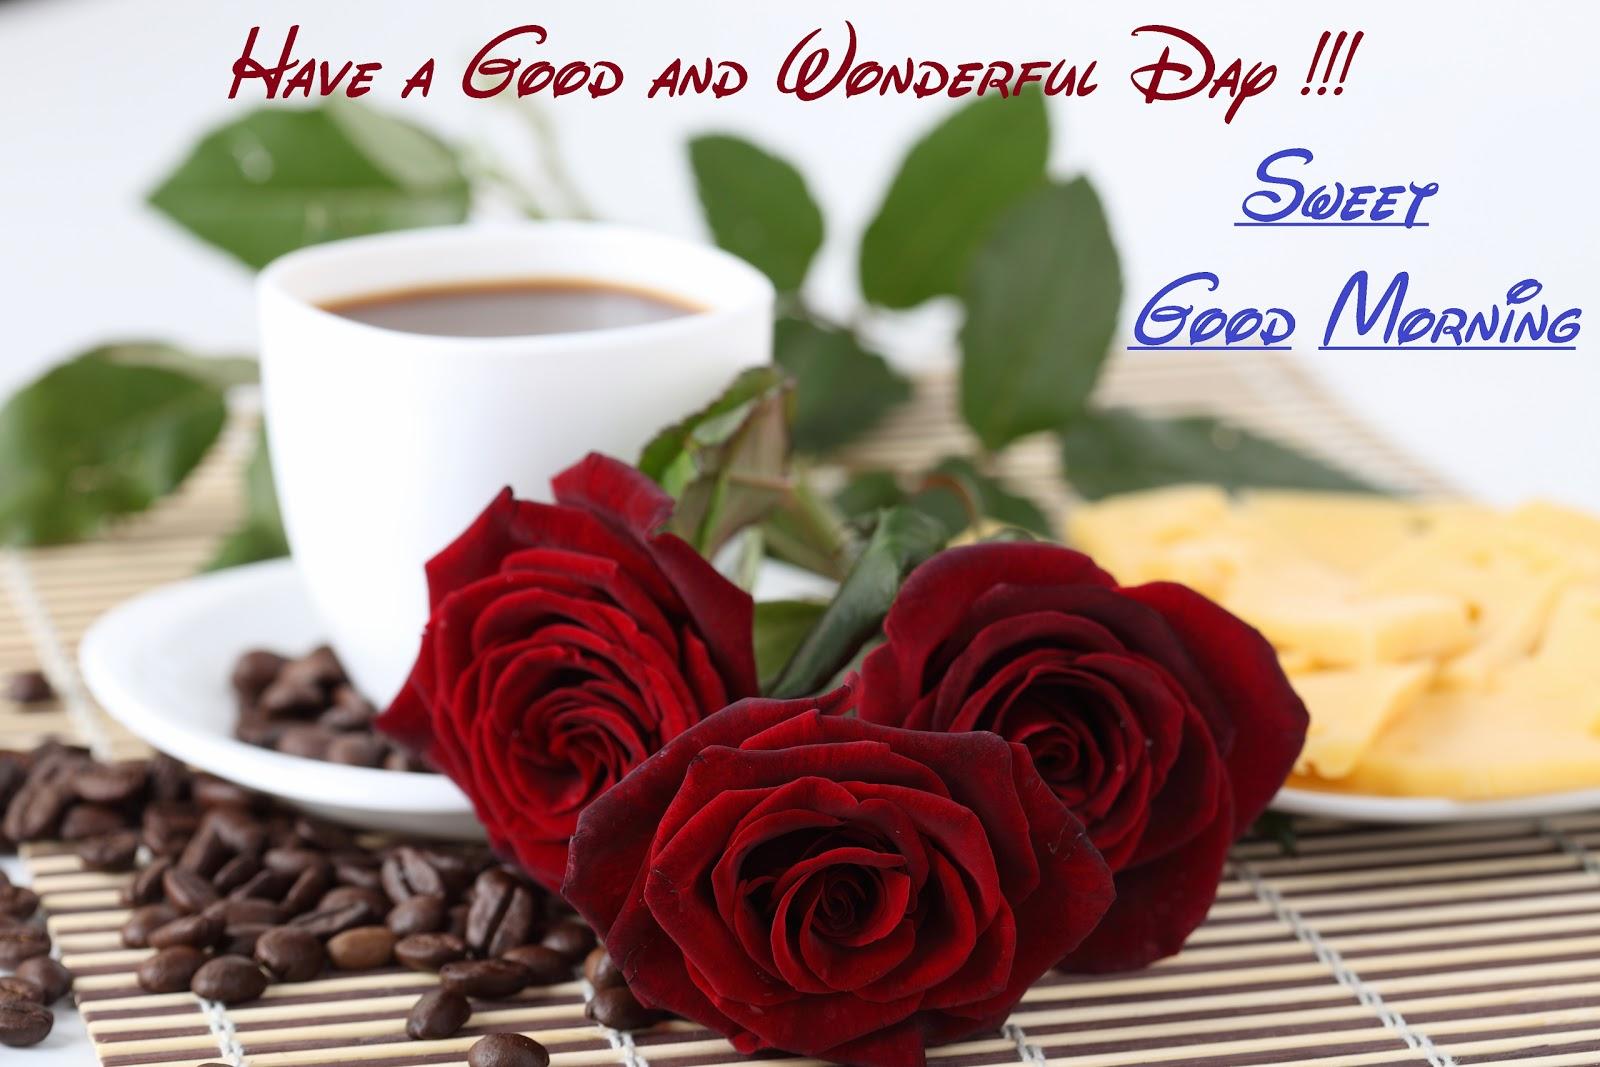 Good-morning-HD-graphic-card-wallpaper-wp425793-1